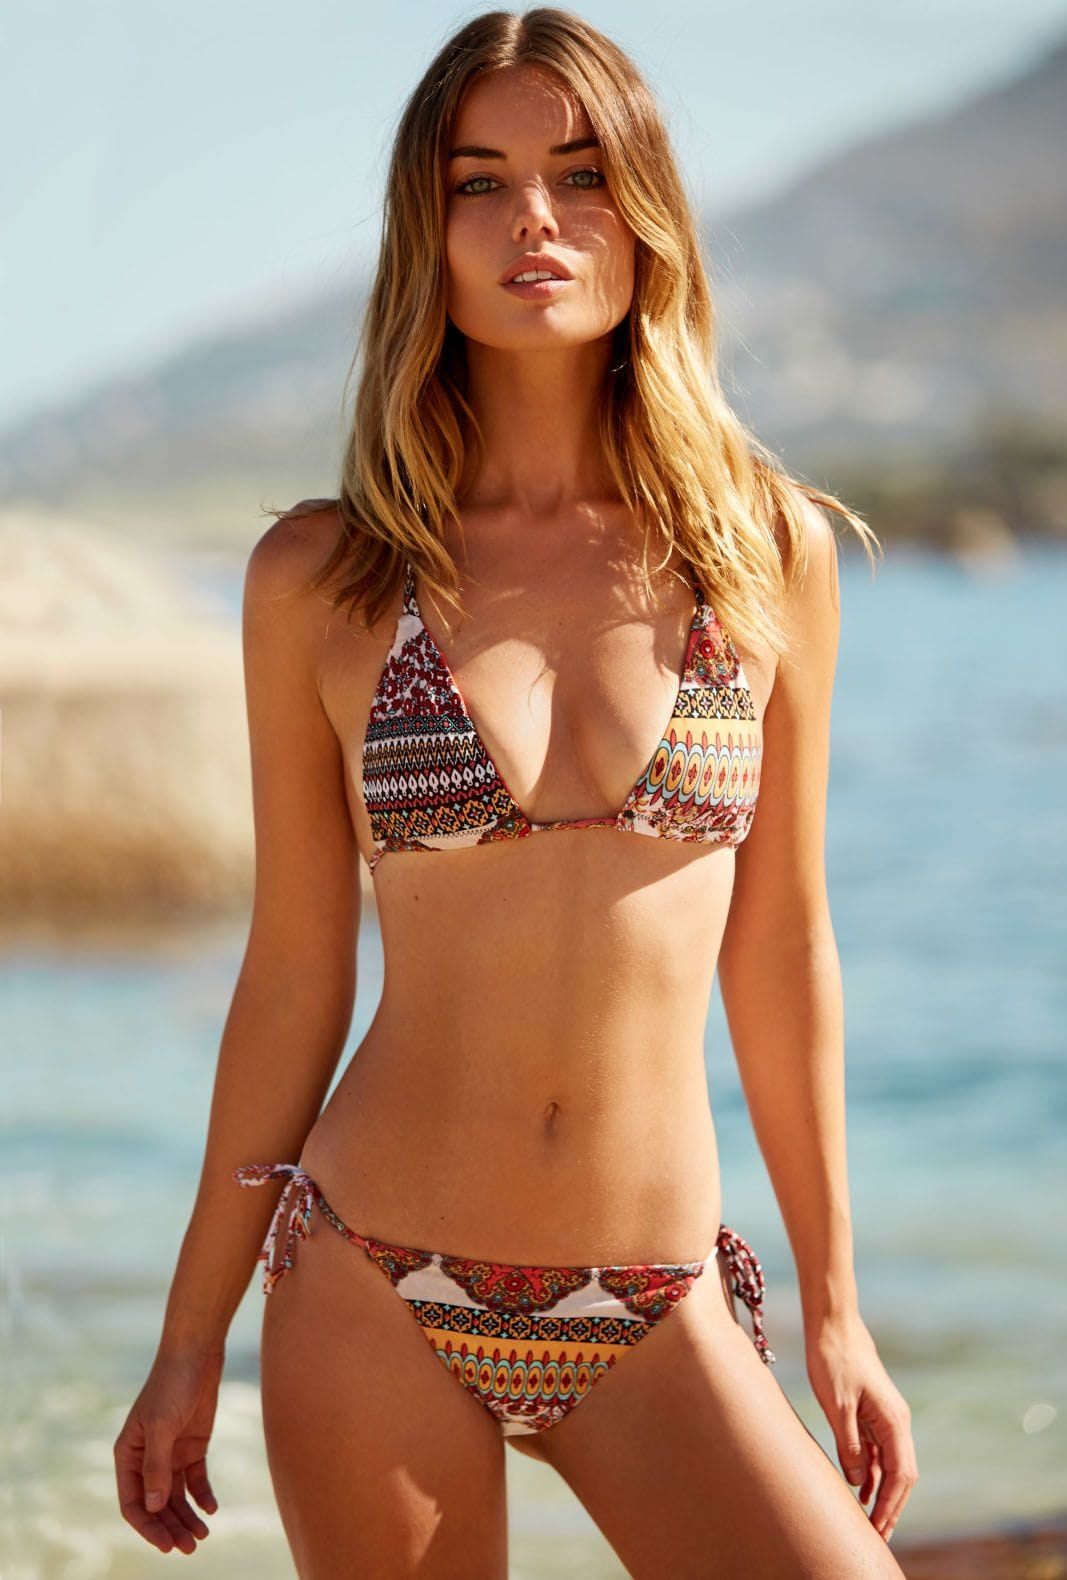 Porno Garcelle Beauvais nude (46 foto and video), Tits, Sideboobs, Boobs, bra 2006